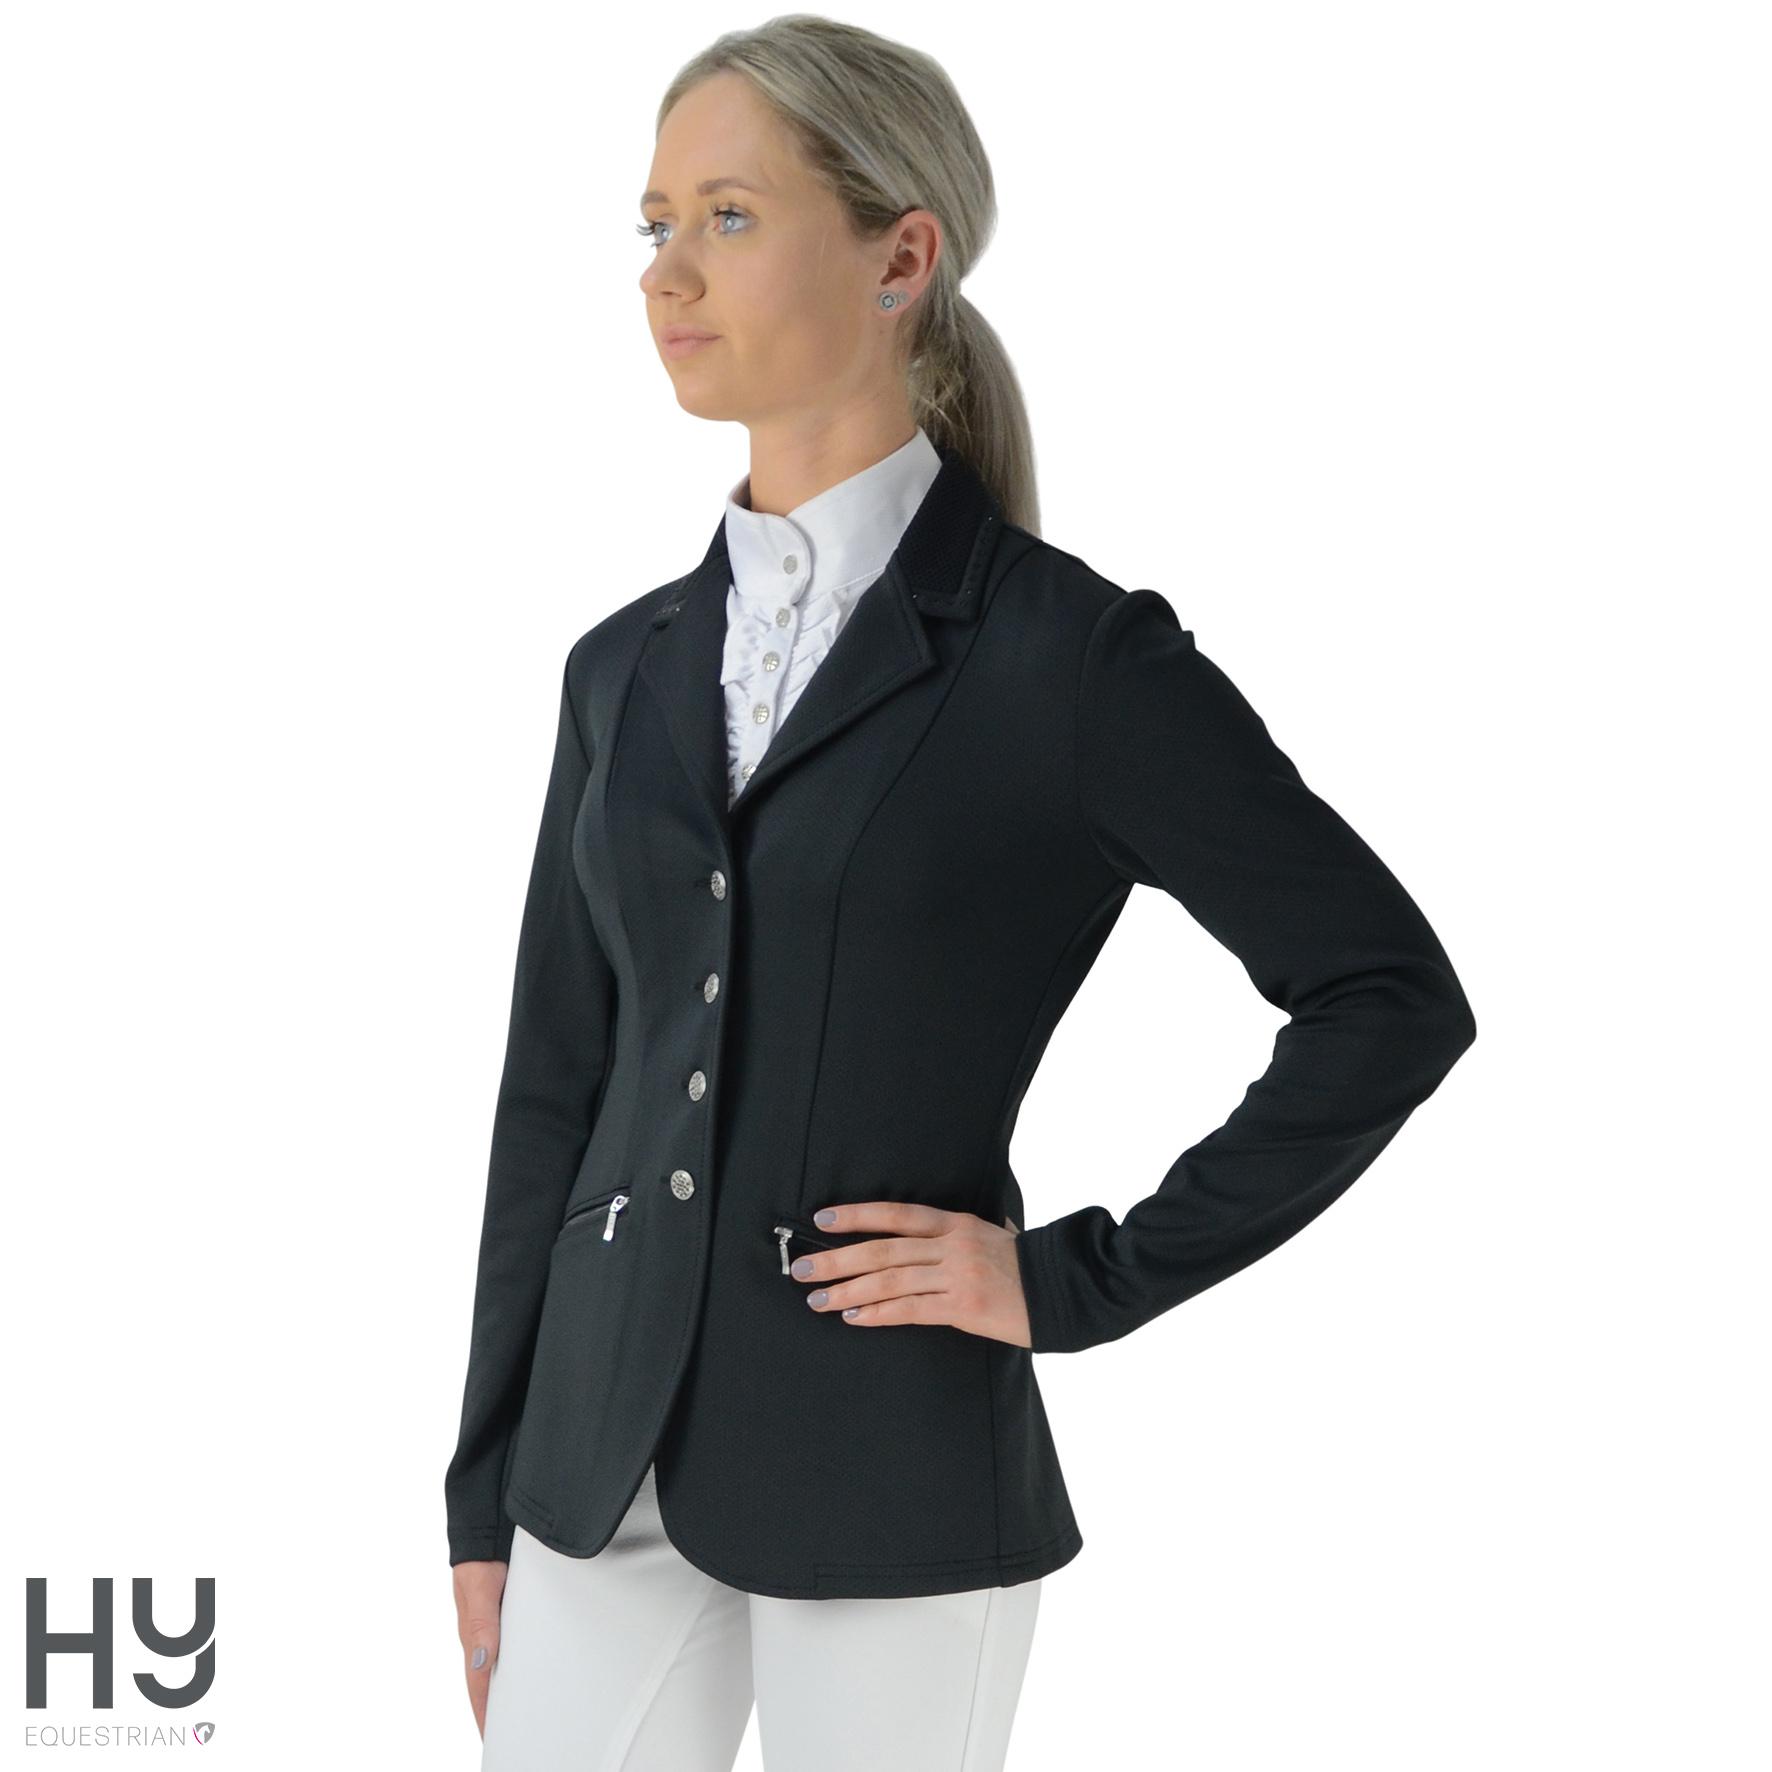 Invictus Pro Competition Jacket